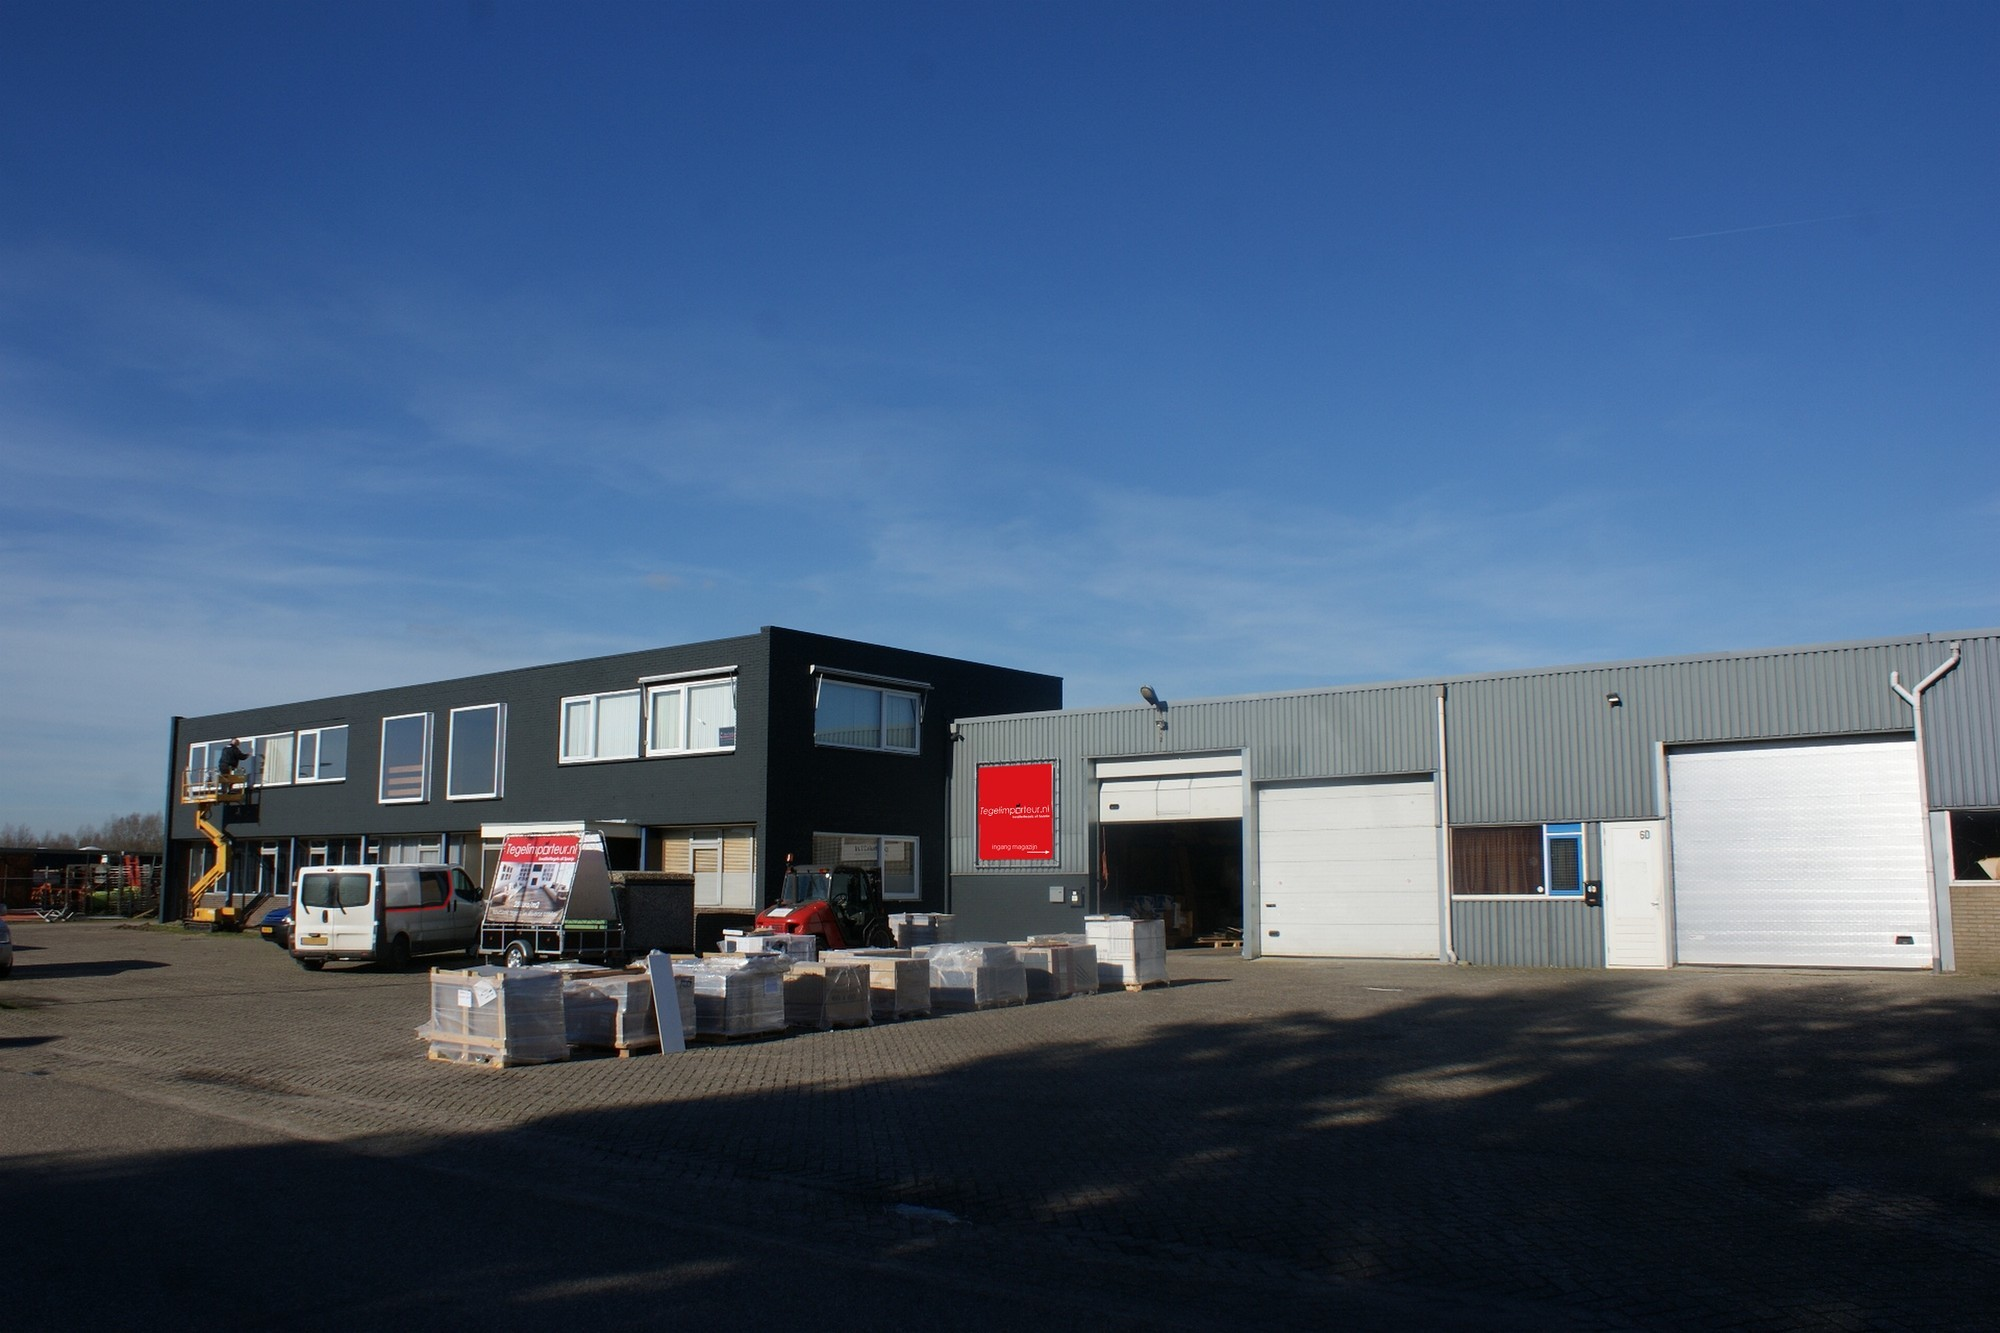 Tegelimporteur Industrieweg 6, Dreumel